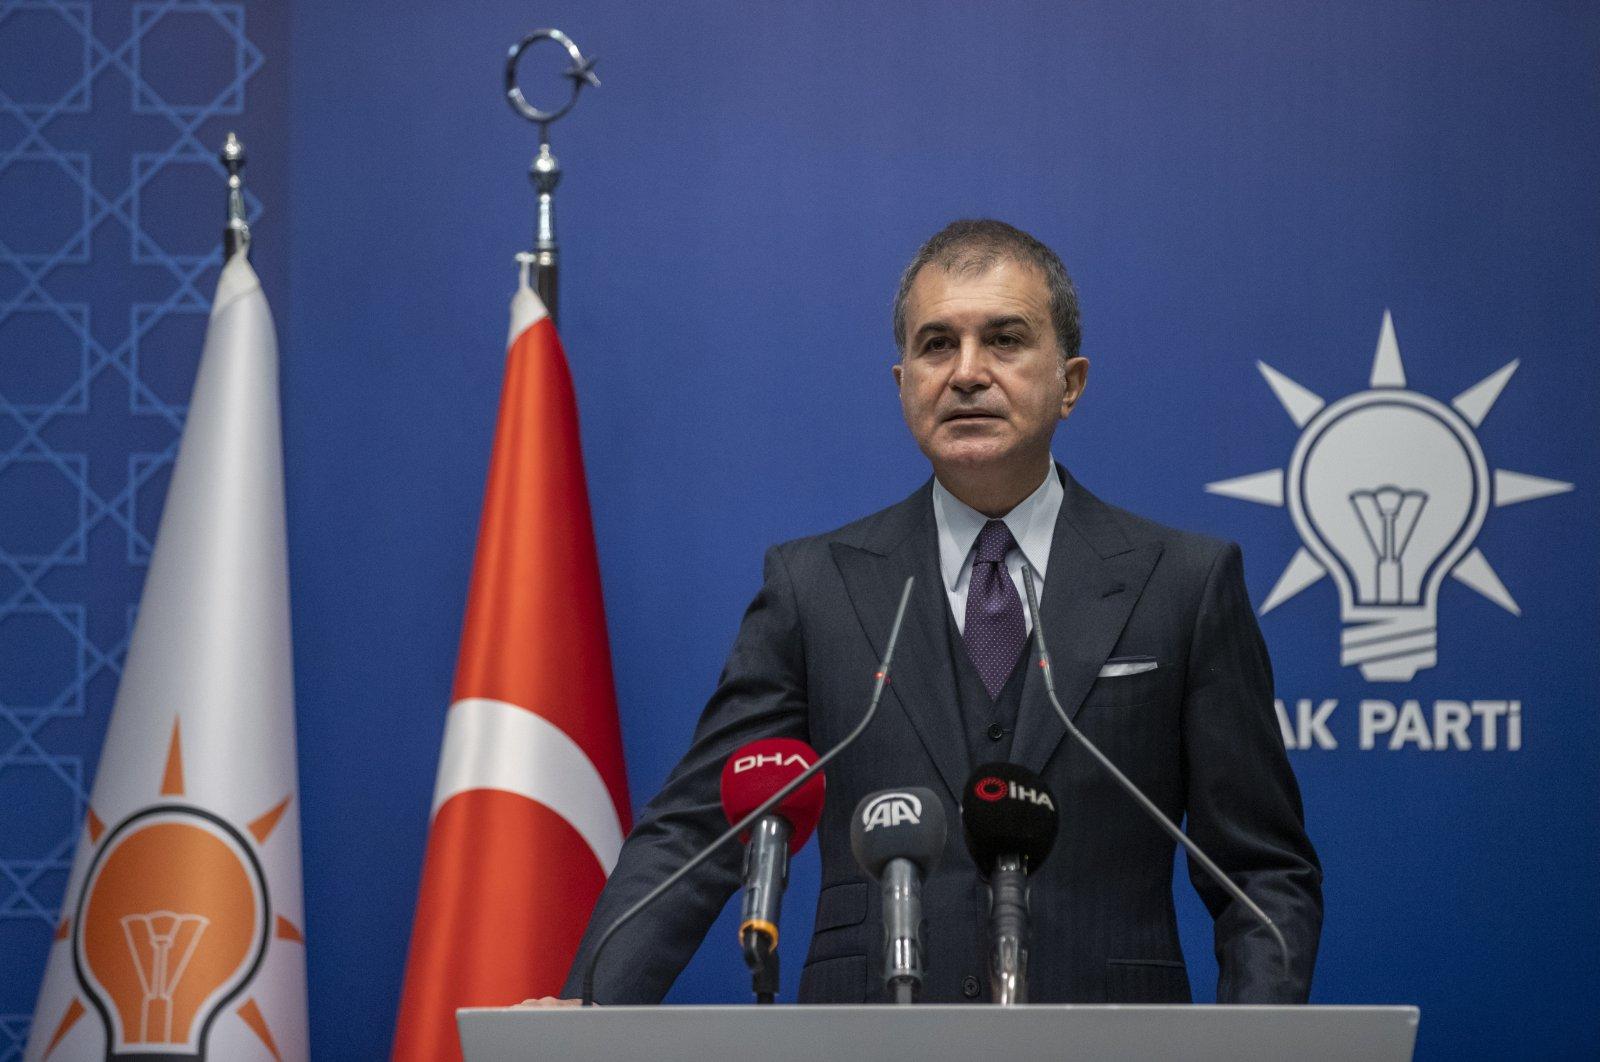 AK Party Spokesperson Ömer Çelik speaks to reporters at a news conference in Ankara on Dec. 8, 2020. (AA Photo)